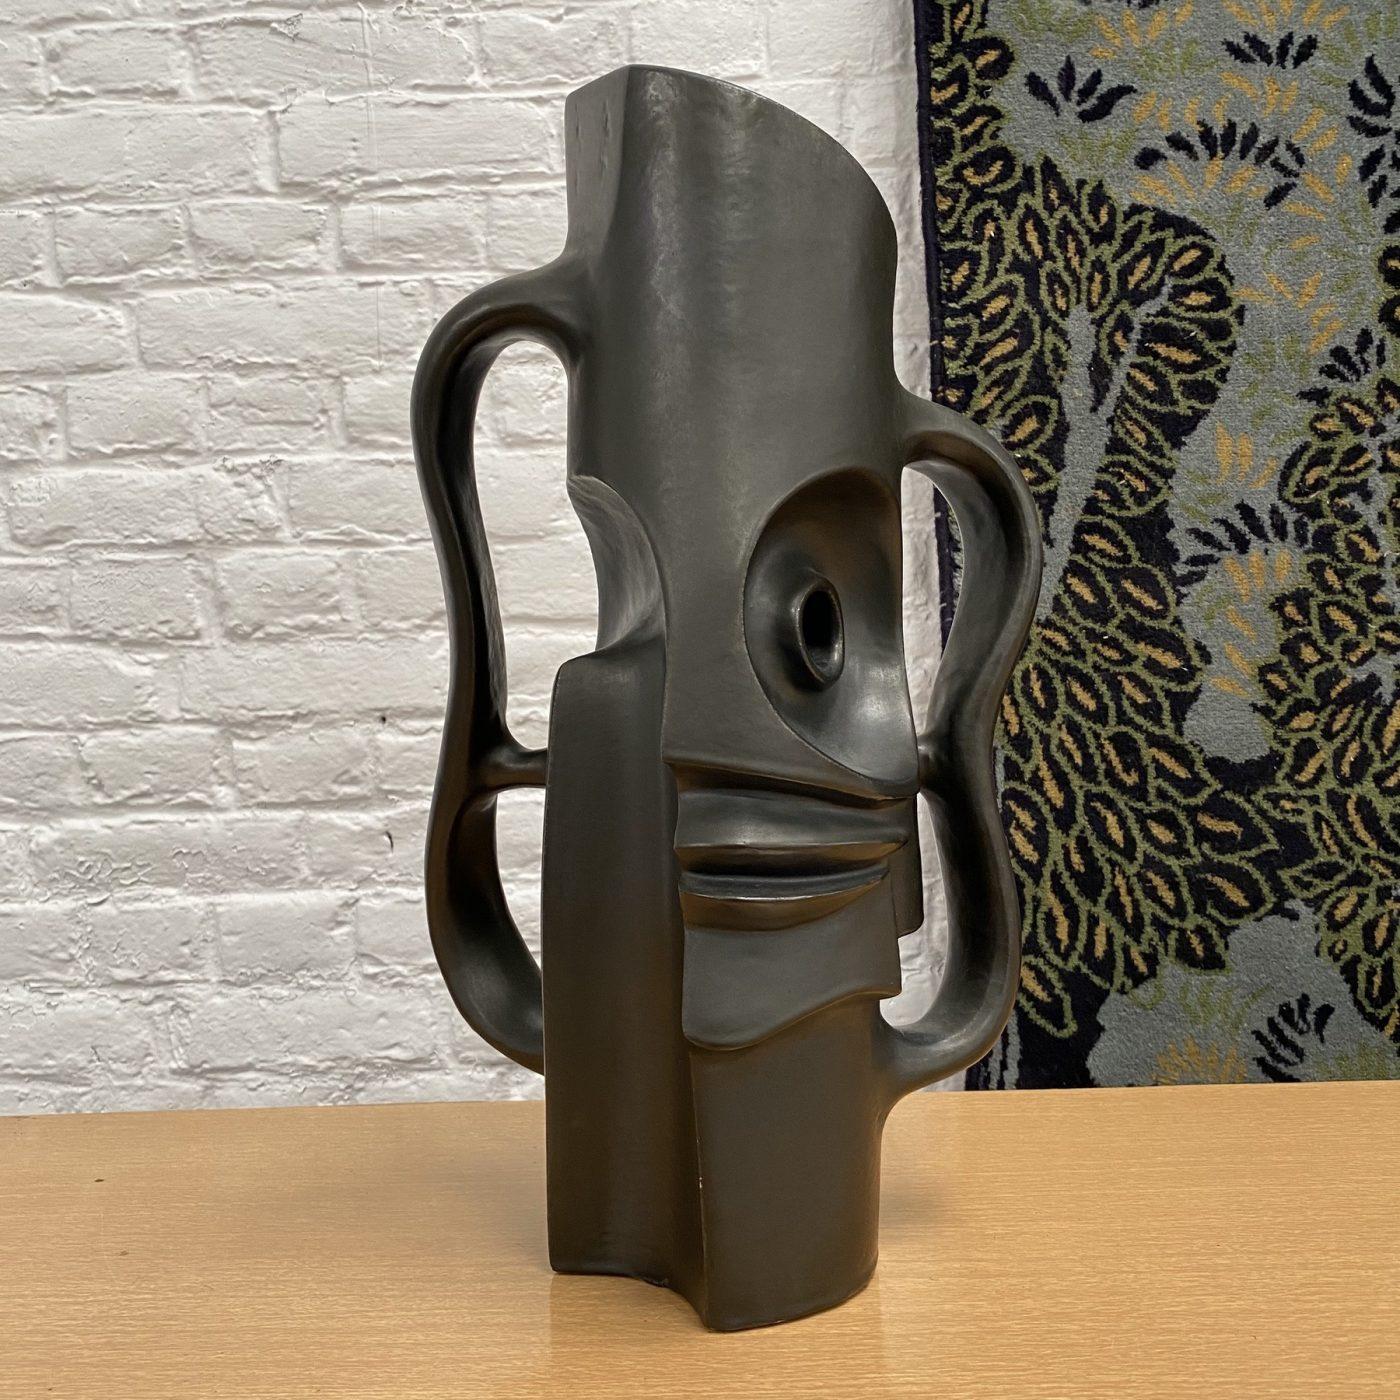 objet-vagabond-ceramic-sculpture0006